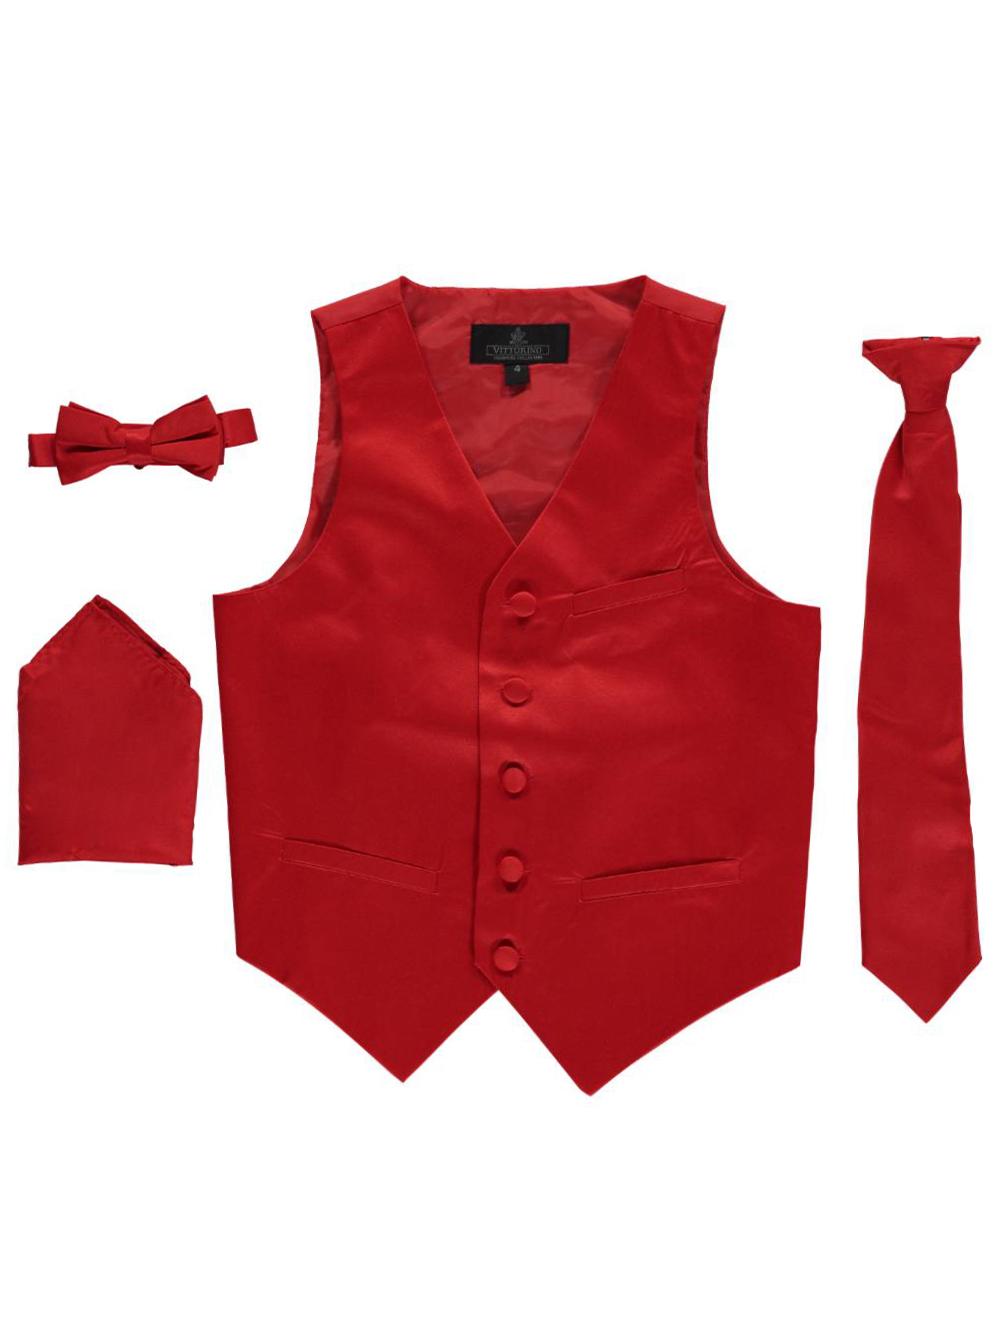 Vittorino Little Boys' 4-Piece Vest & Accessories Set (Sizes 4 - 7) - red, 4